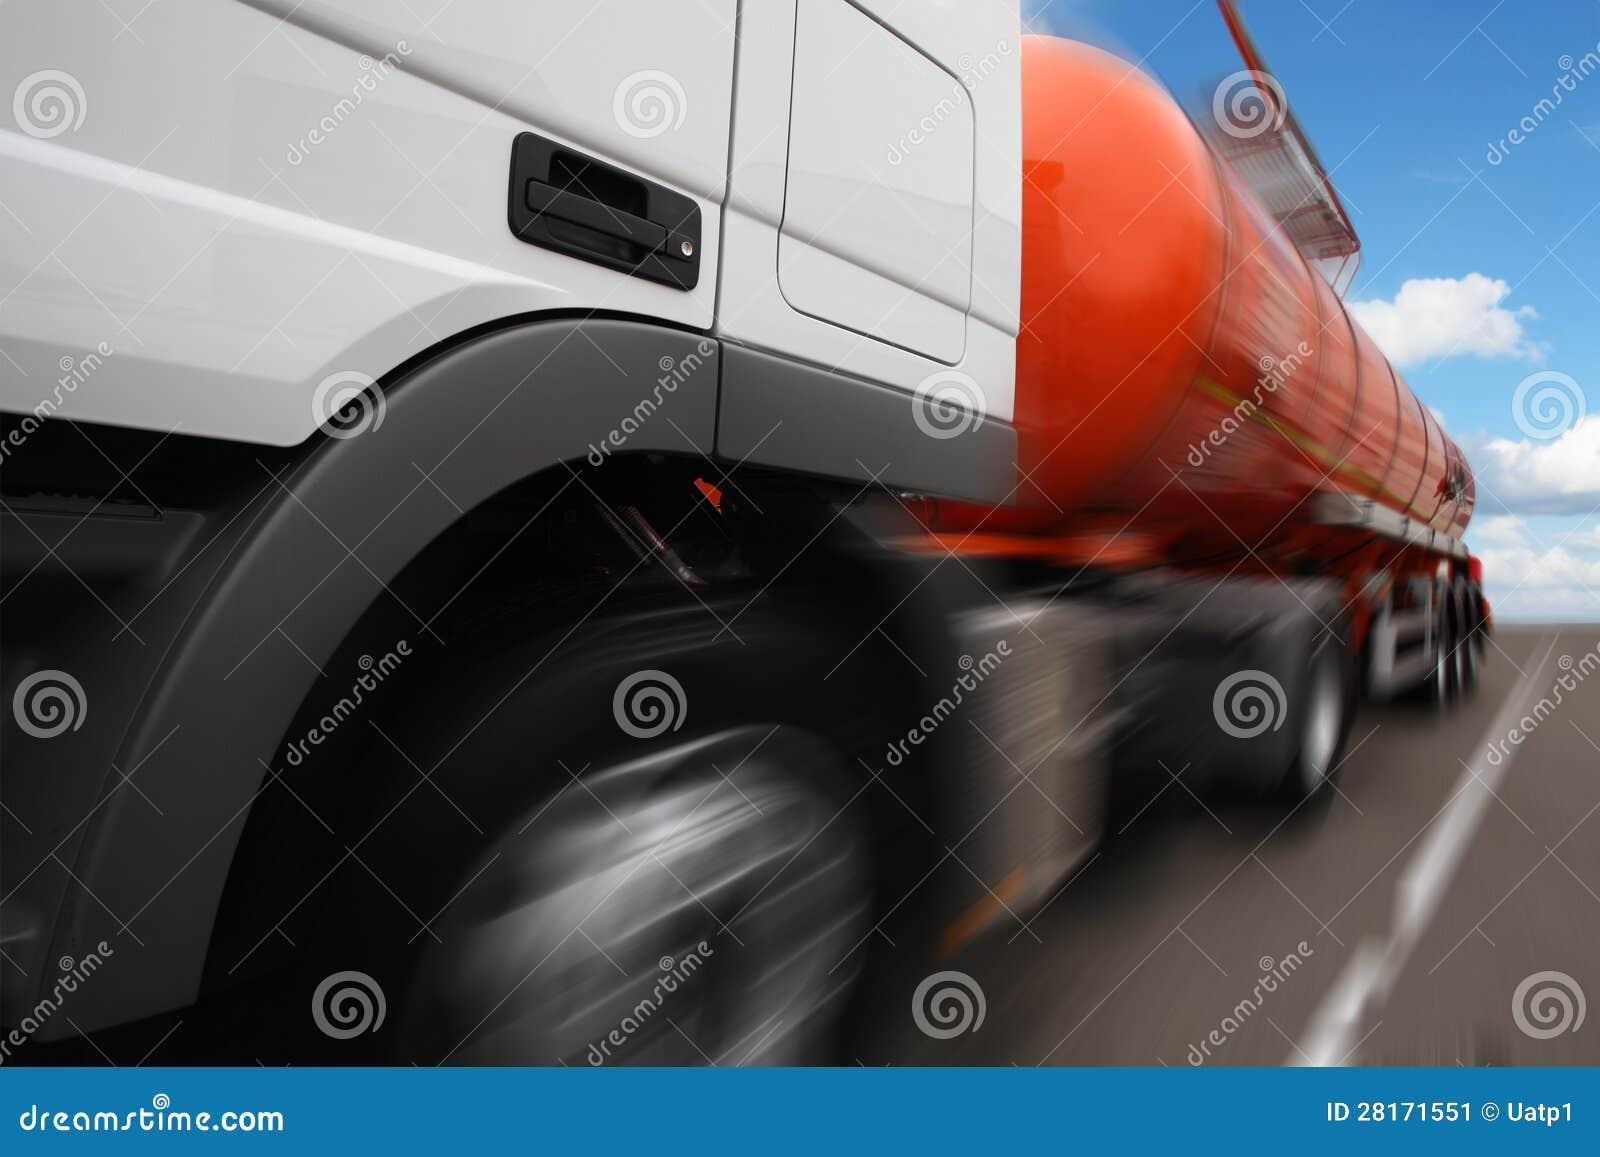 a tank truck